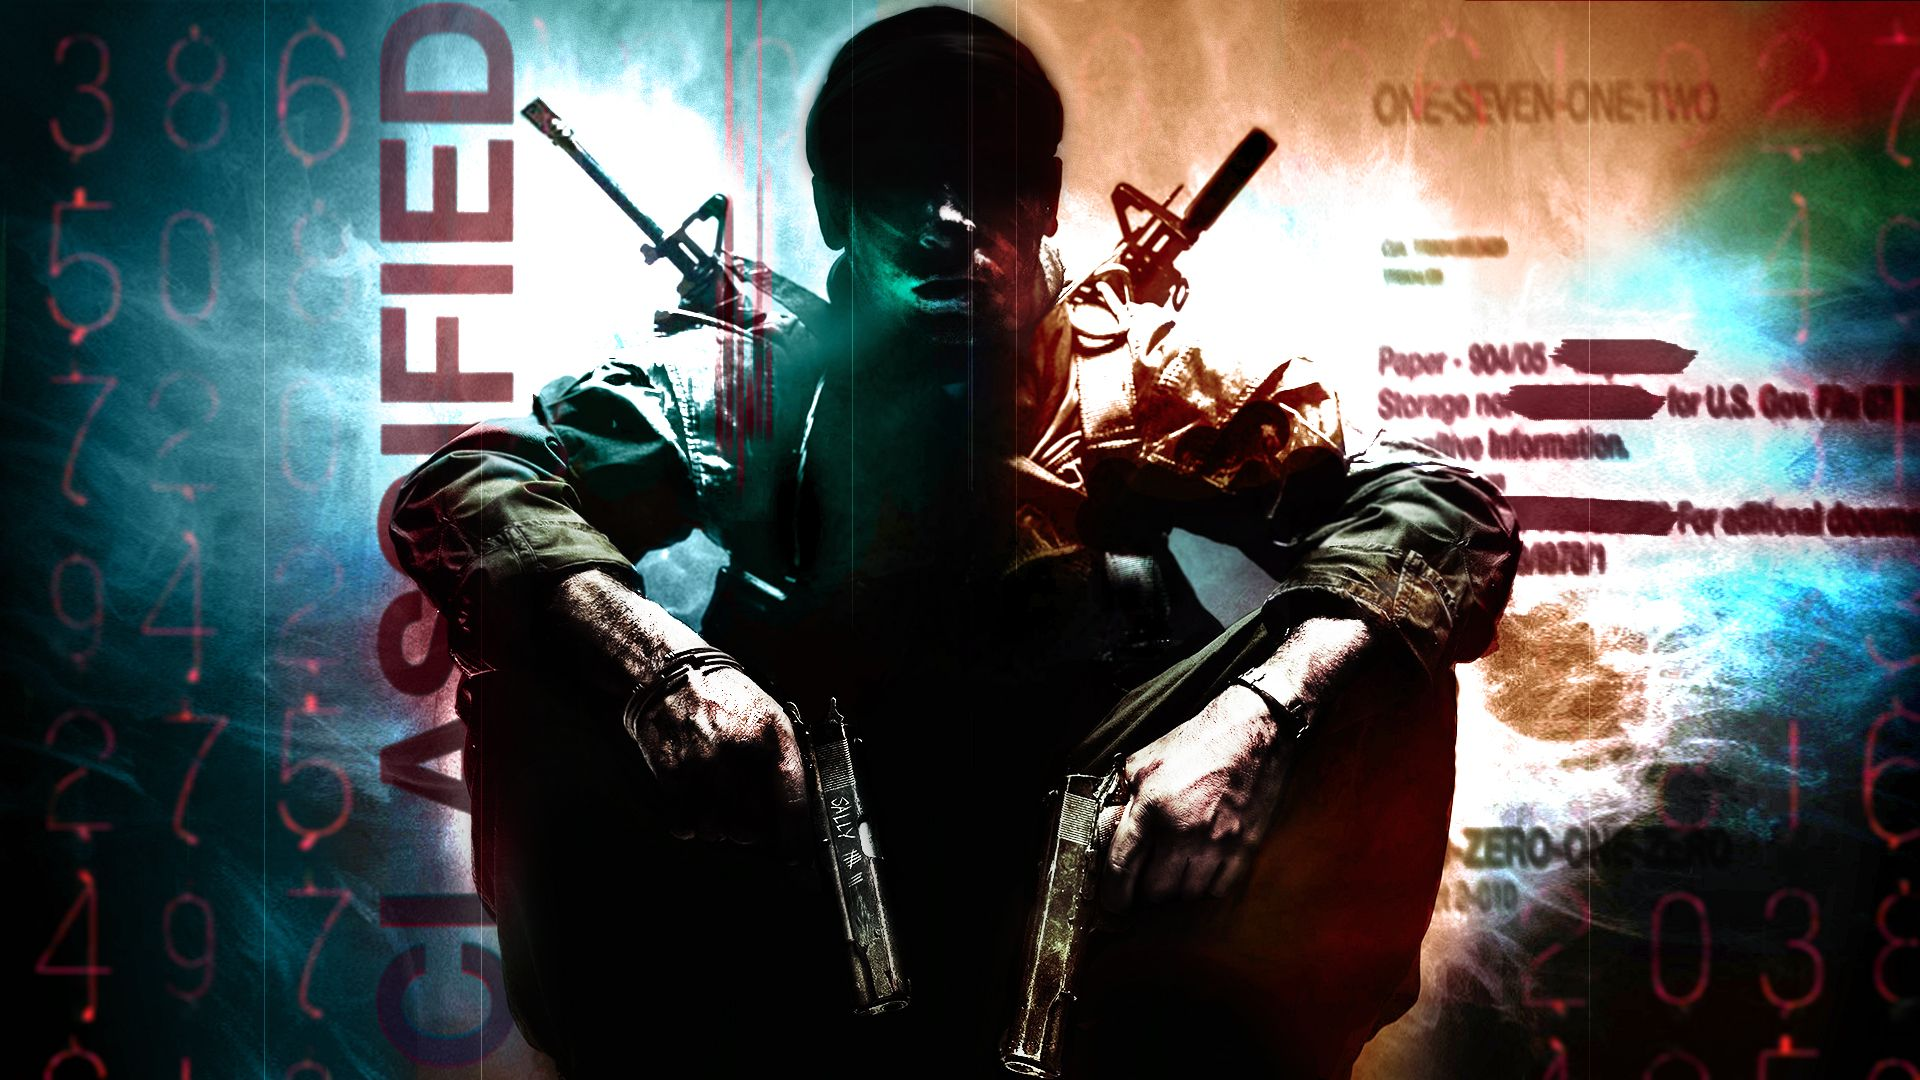 cod bo1 download free